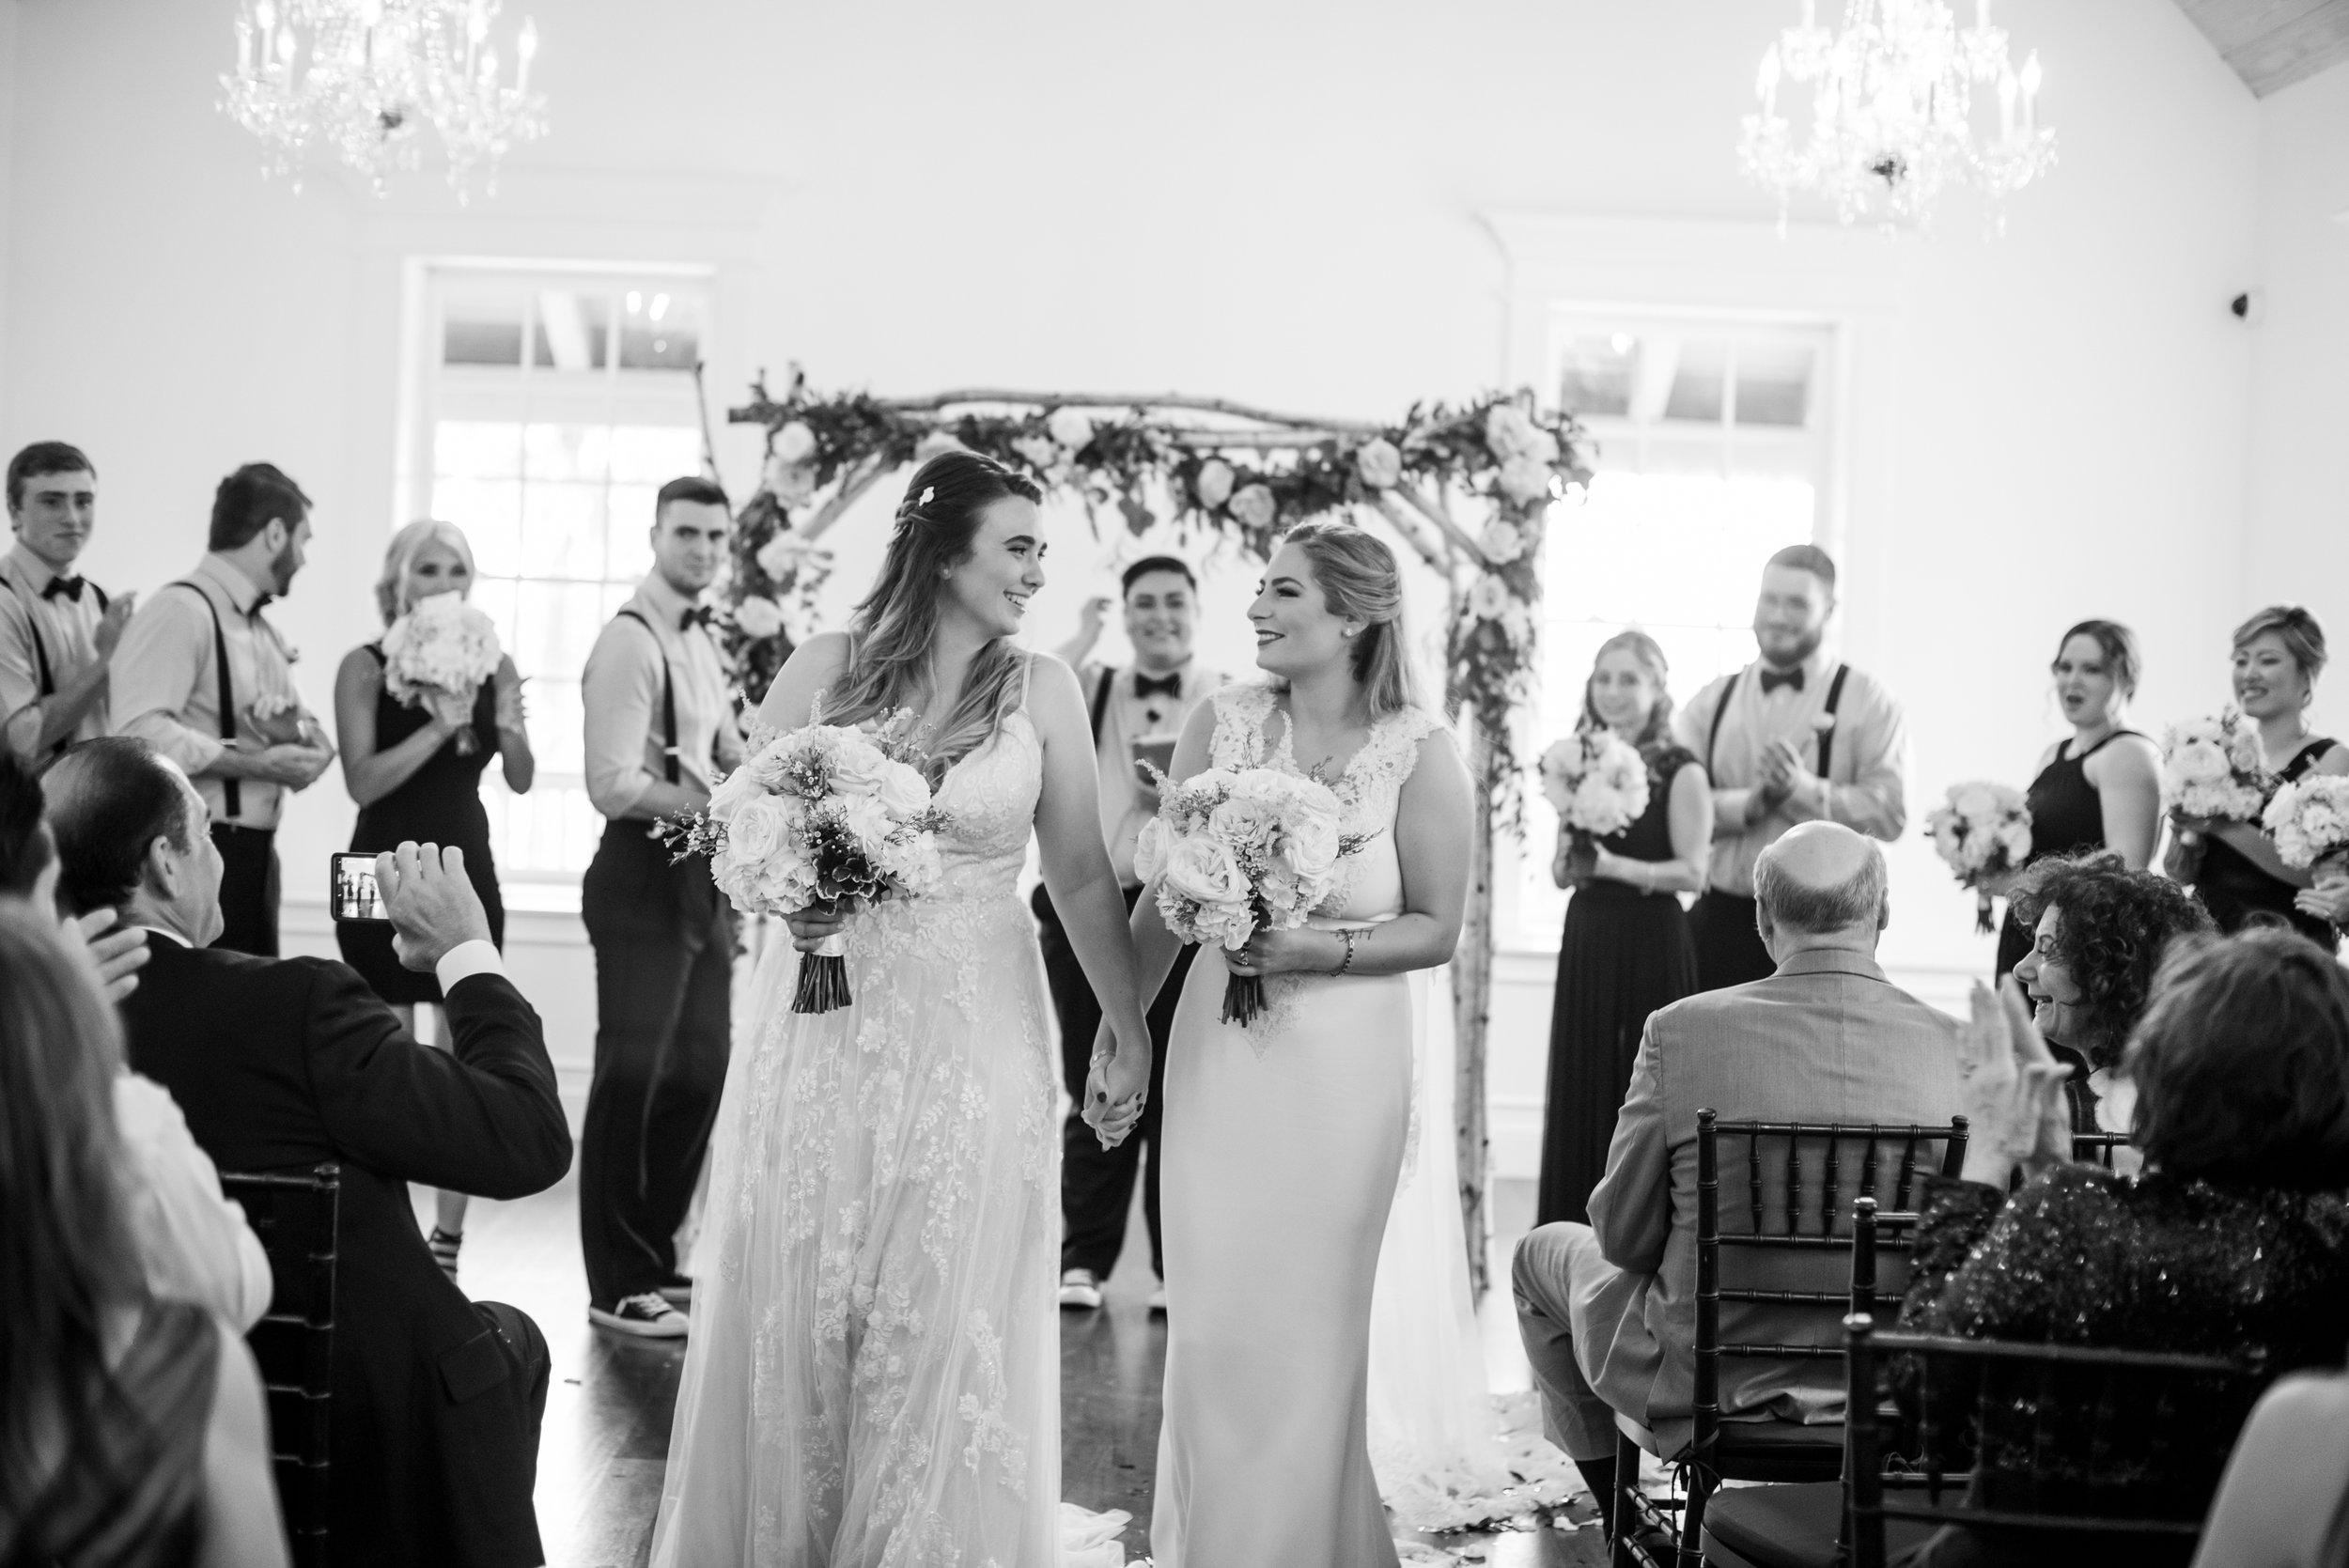 st-augustine-photographer-st-augustine-gay-wedding-sam-sex-wedding-photographer-sarah-annay-photography-white-room-weddings-31.jpg